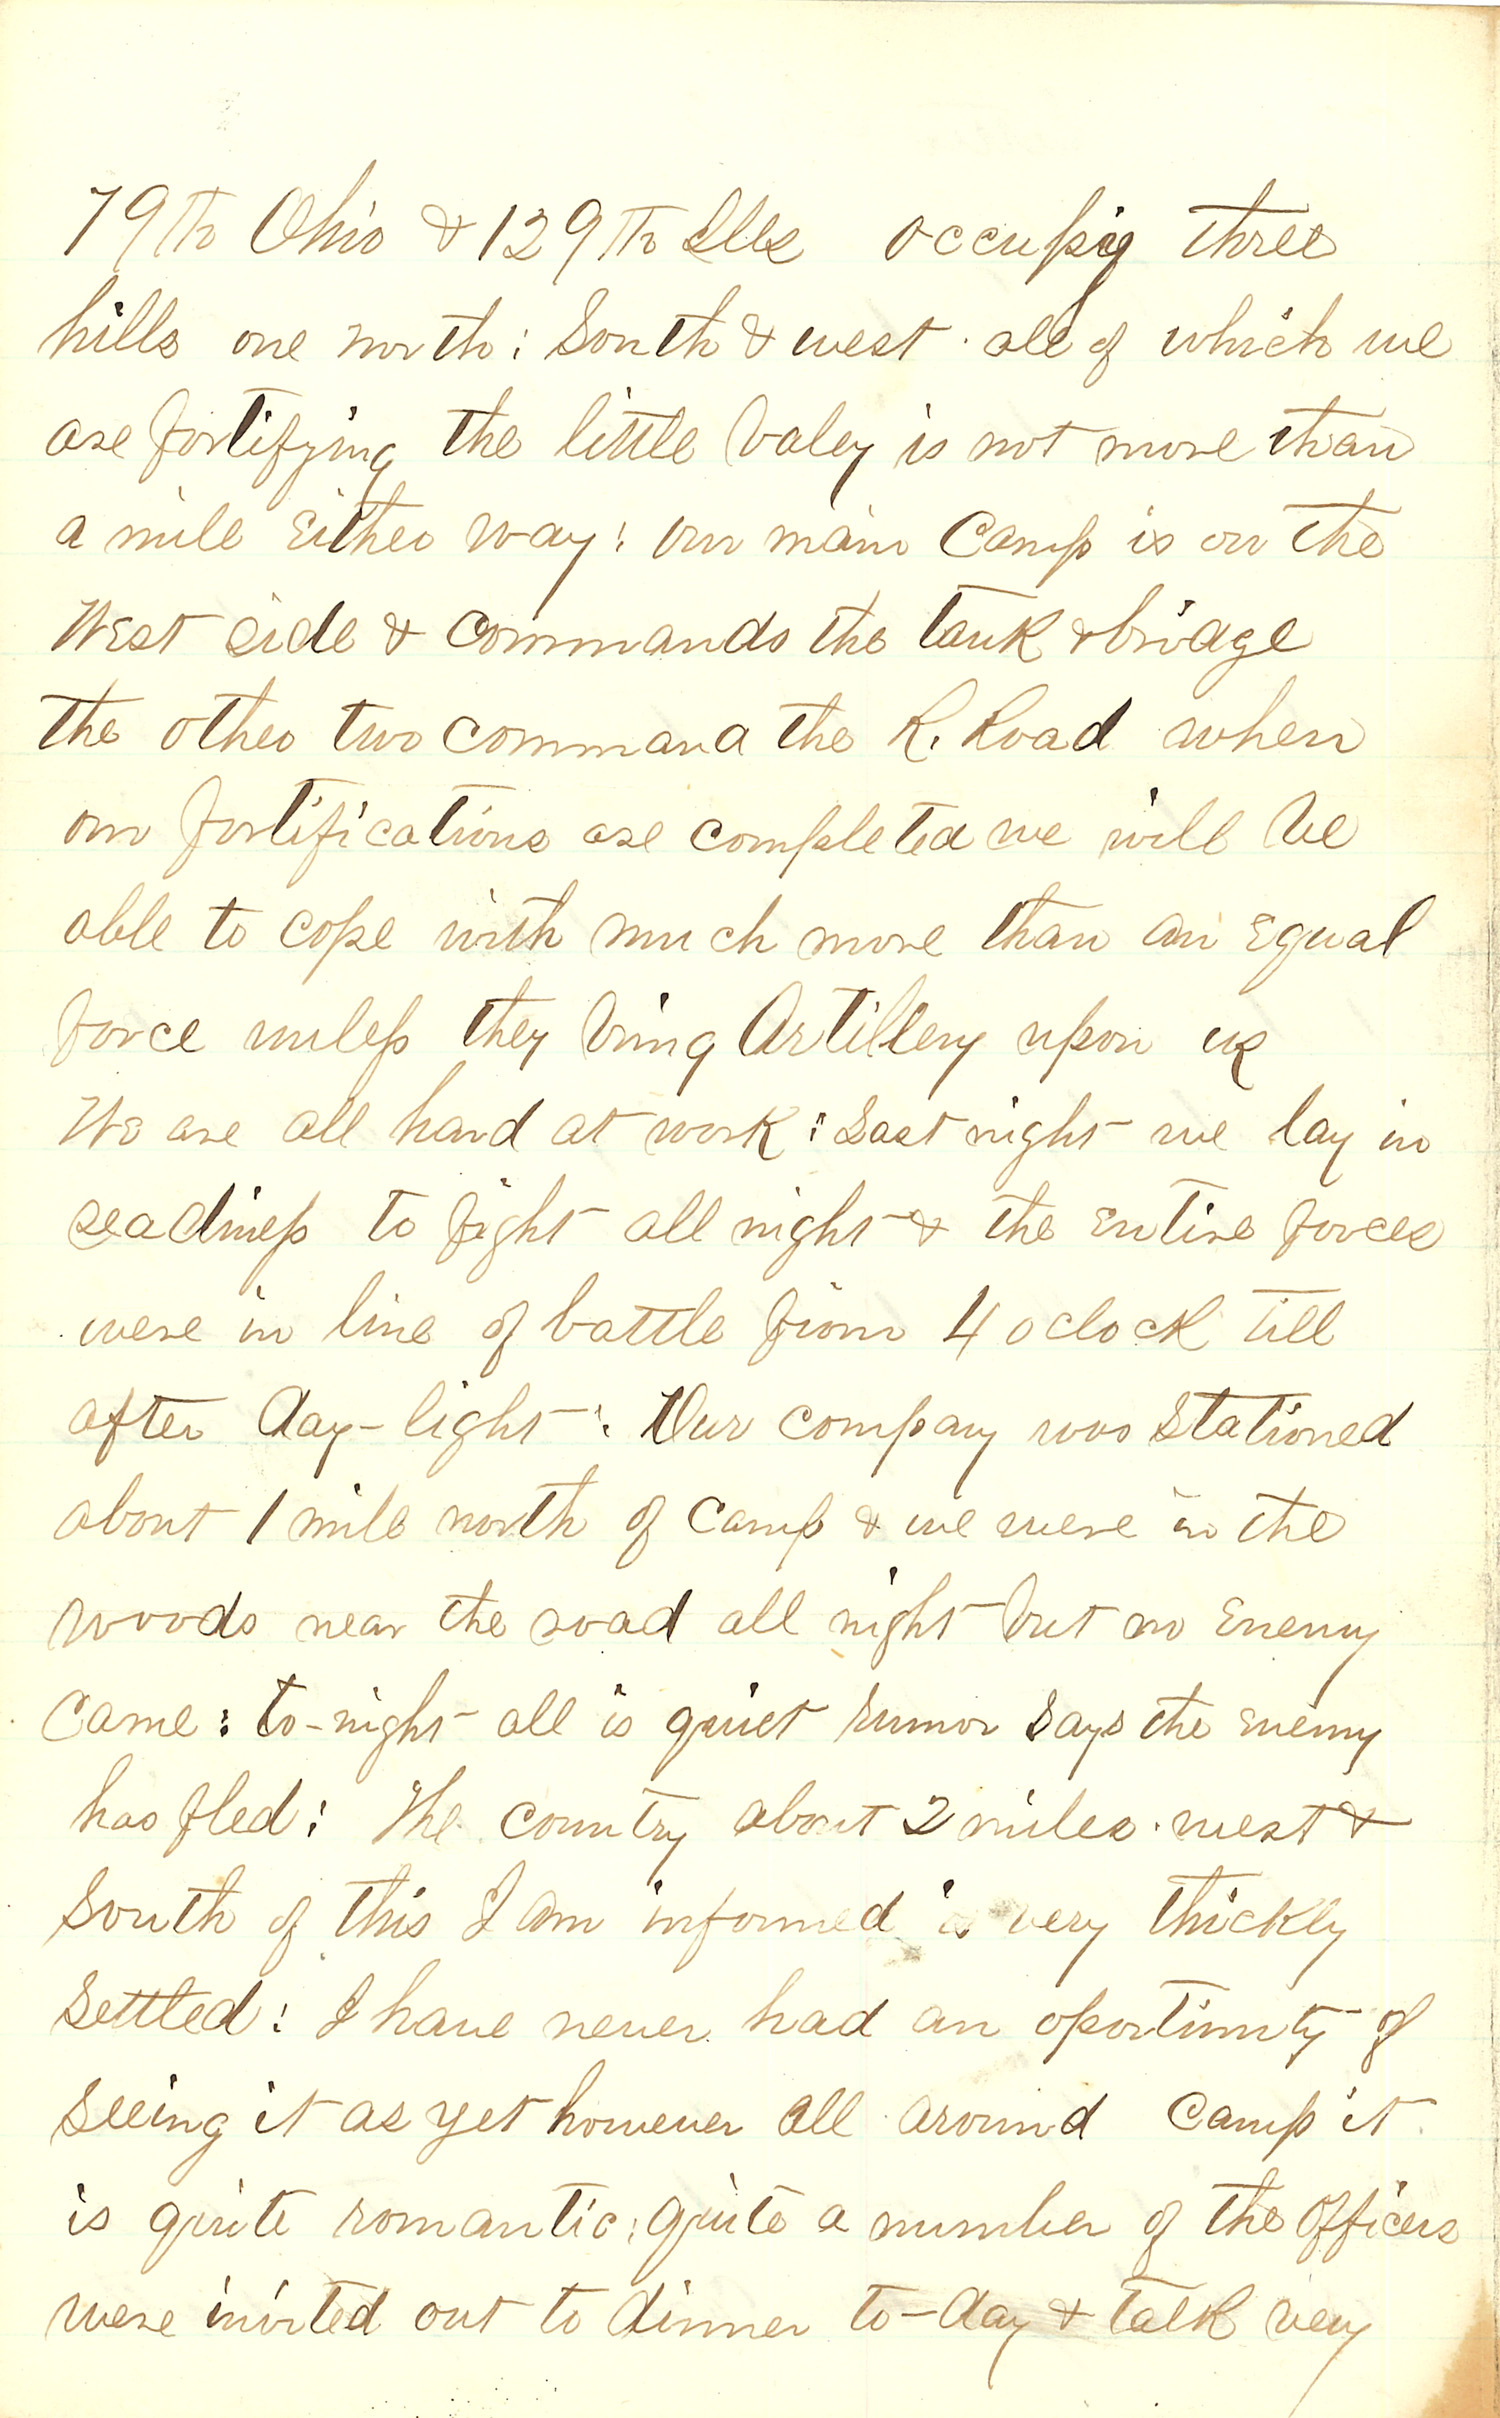 Joseph Culver Letter, December 25, 1862, Letter 2, Page 2